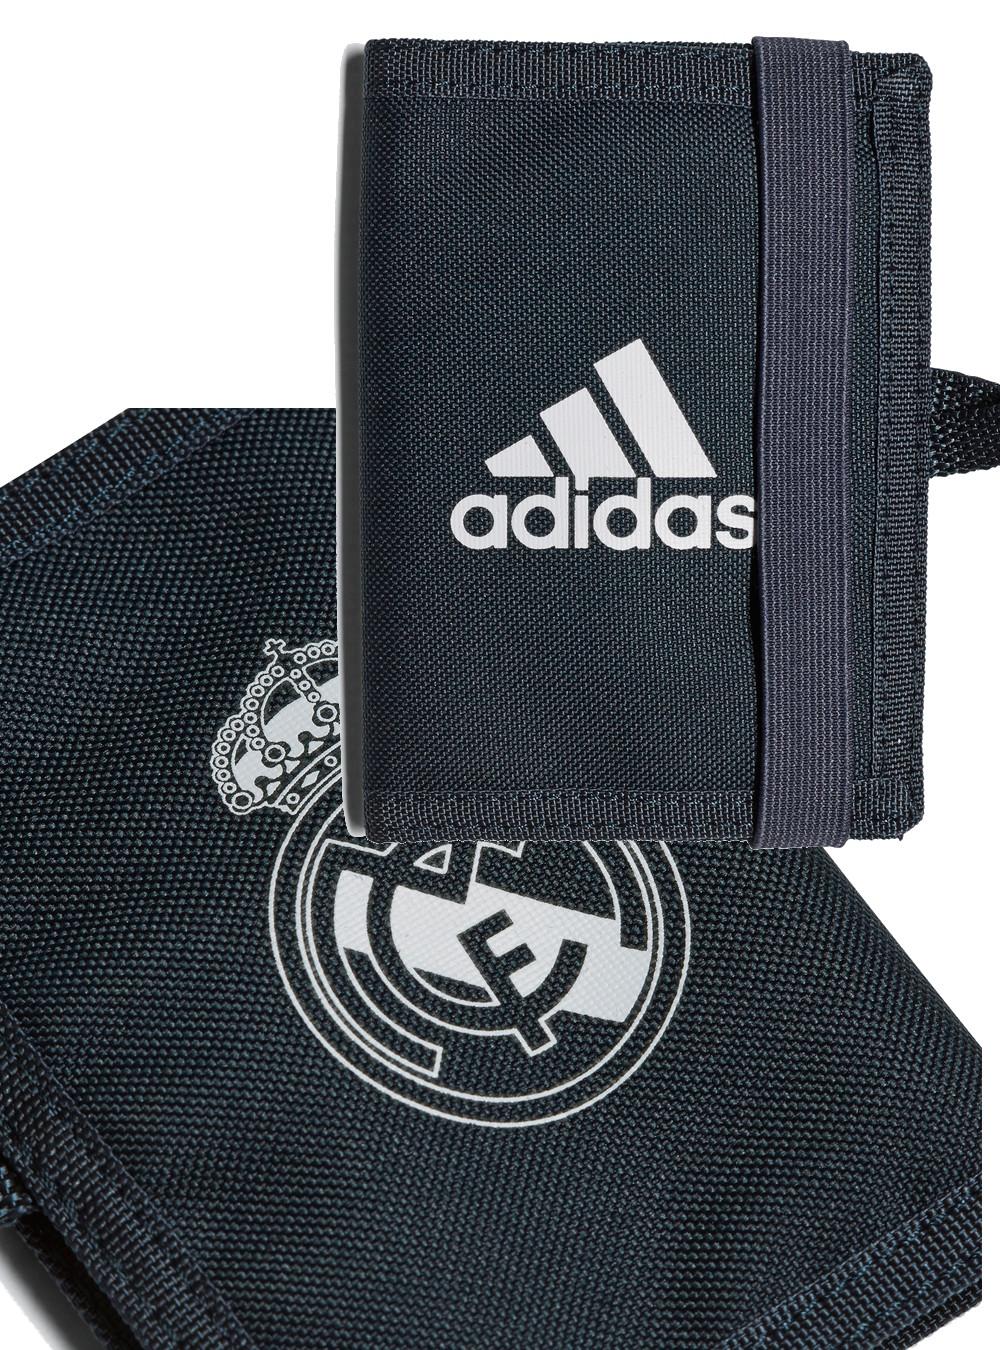 2019 Moda Real Madrid Adidas Portafoglio Porta Documenti Porta Monete Tg Wallet Blu Prestazioni Affidabili